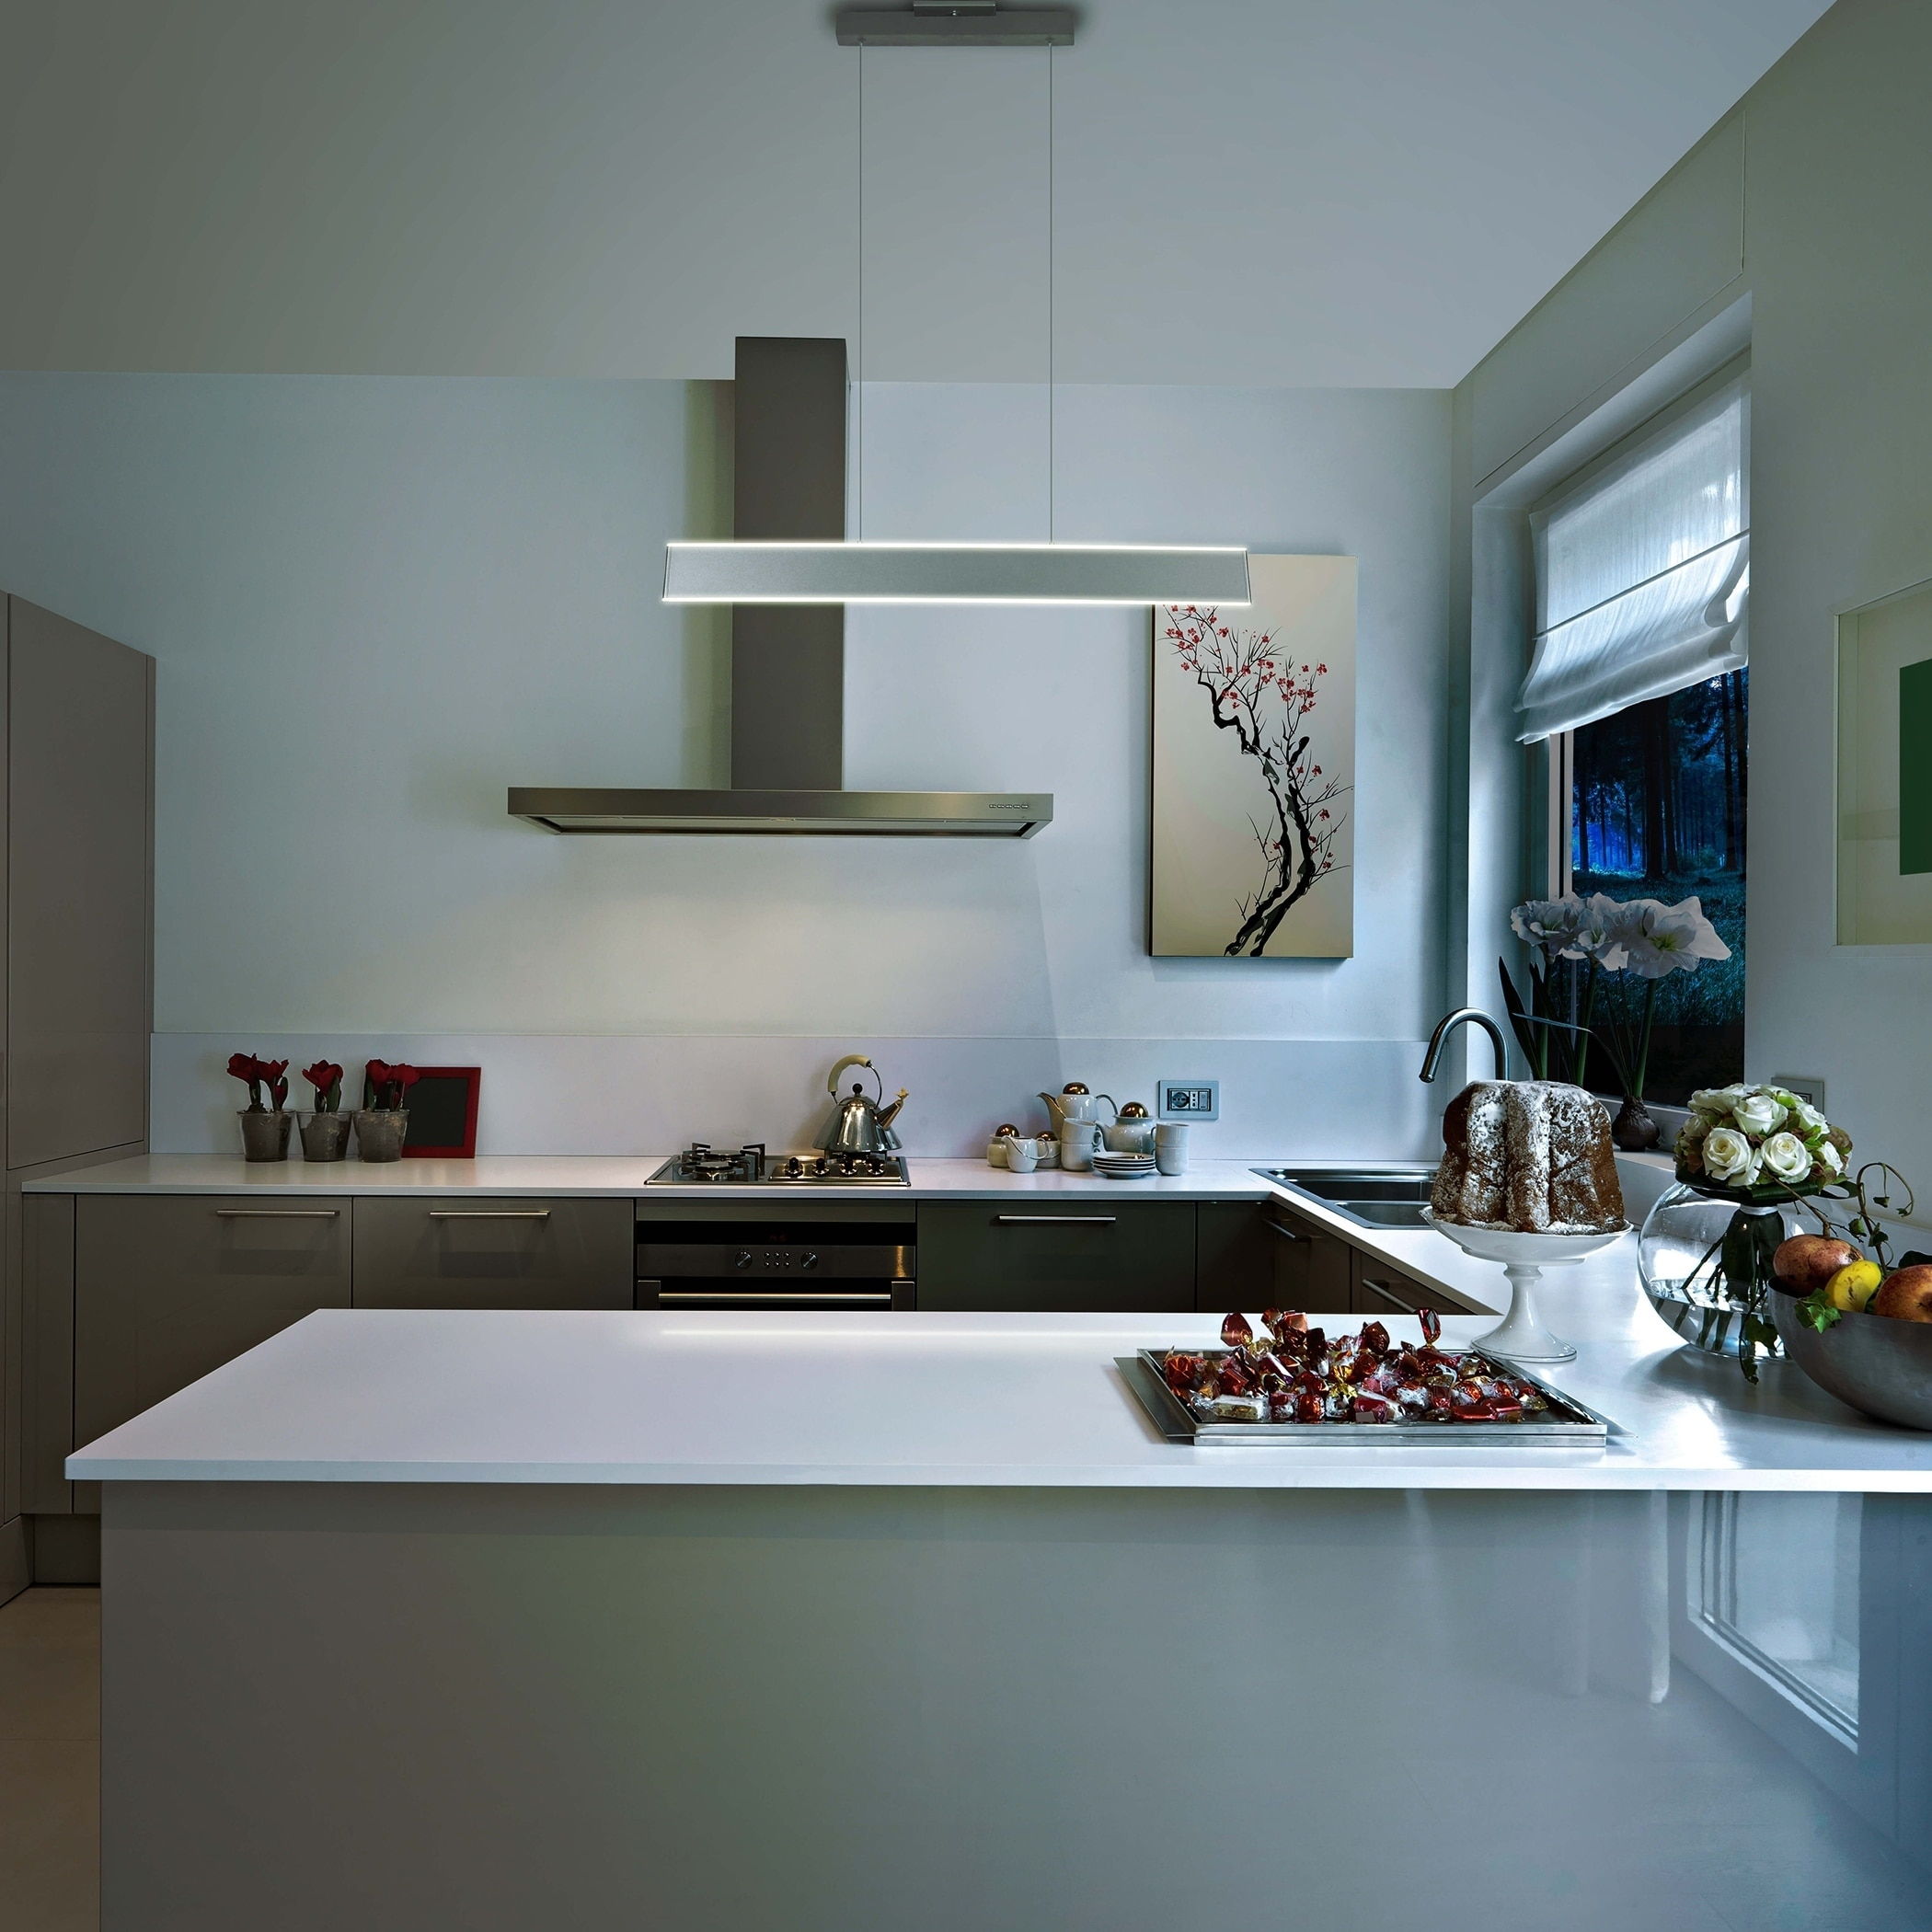 Shop VONN Lighting VMC36900AL Wezen 35-inch Integrated LED Linear ...